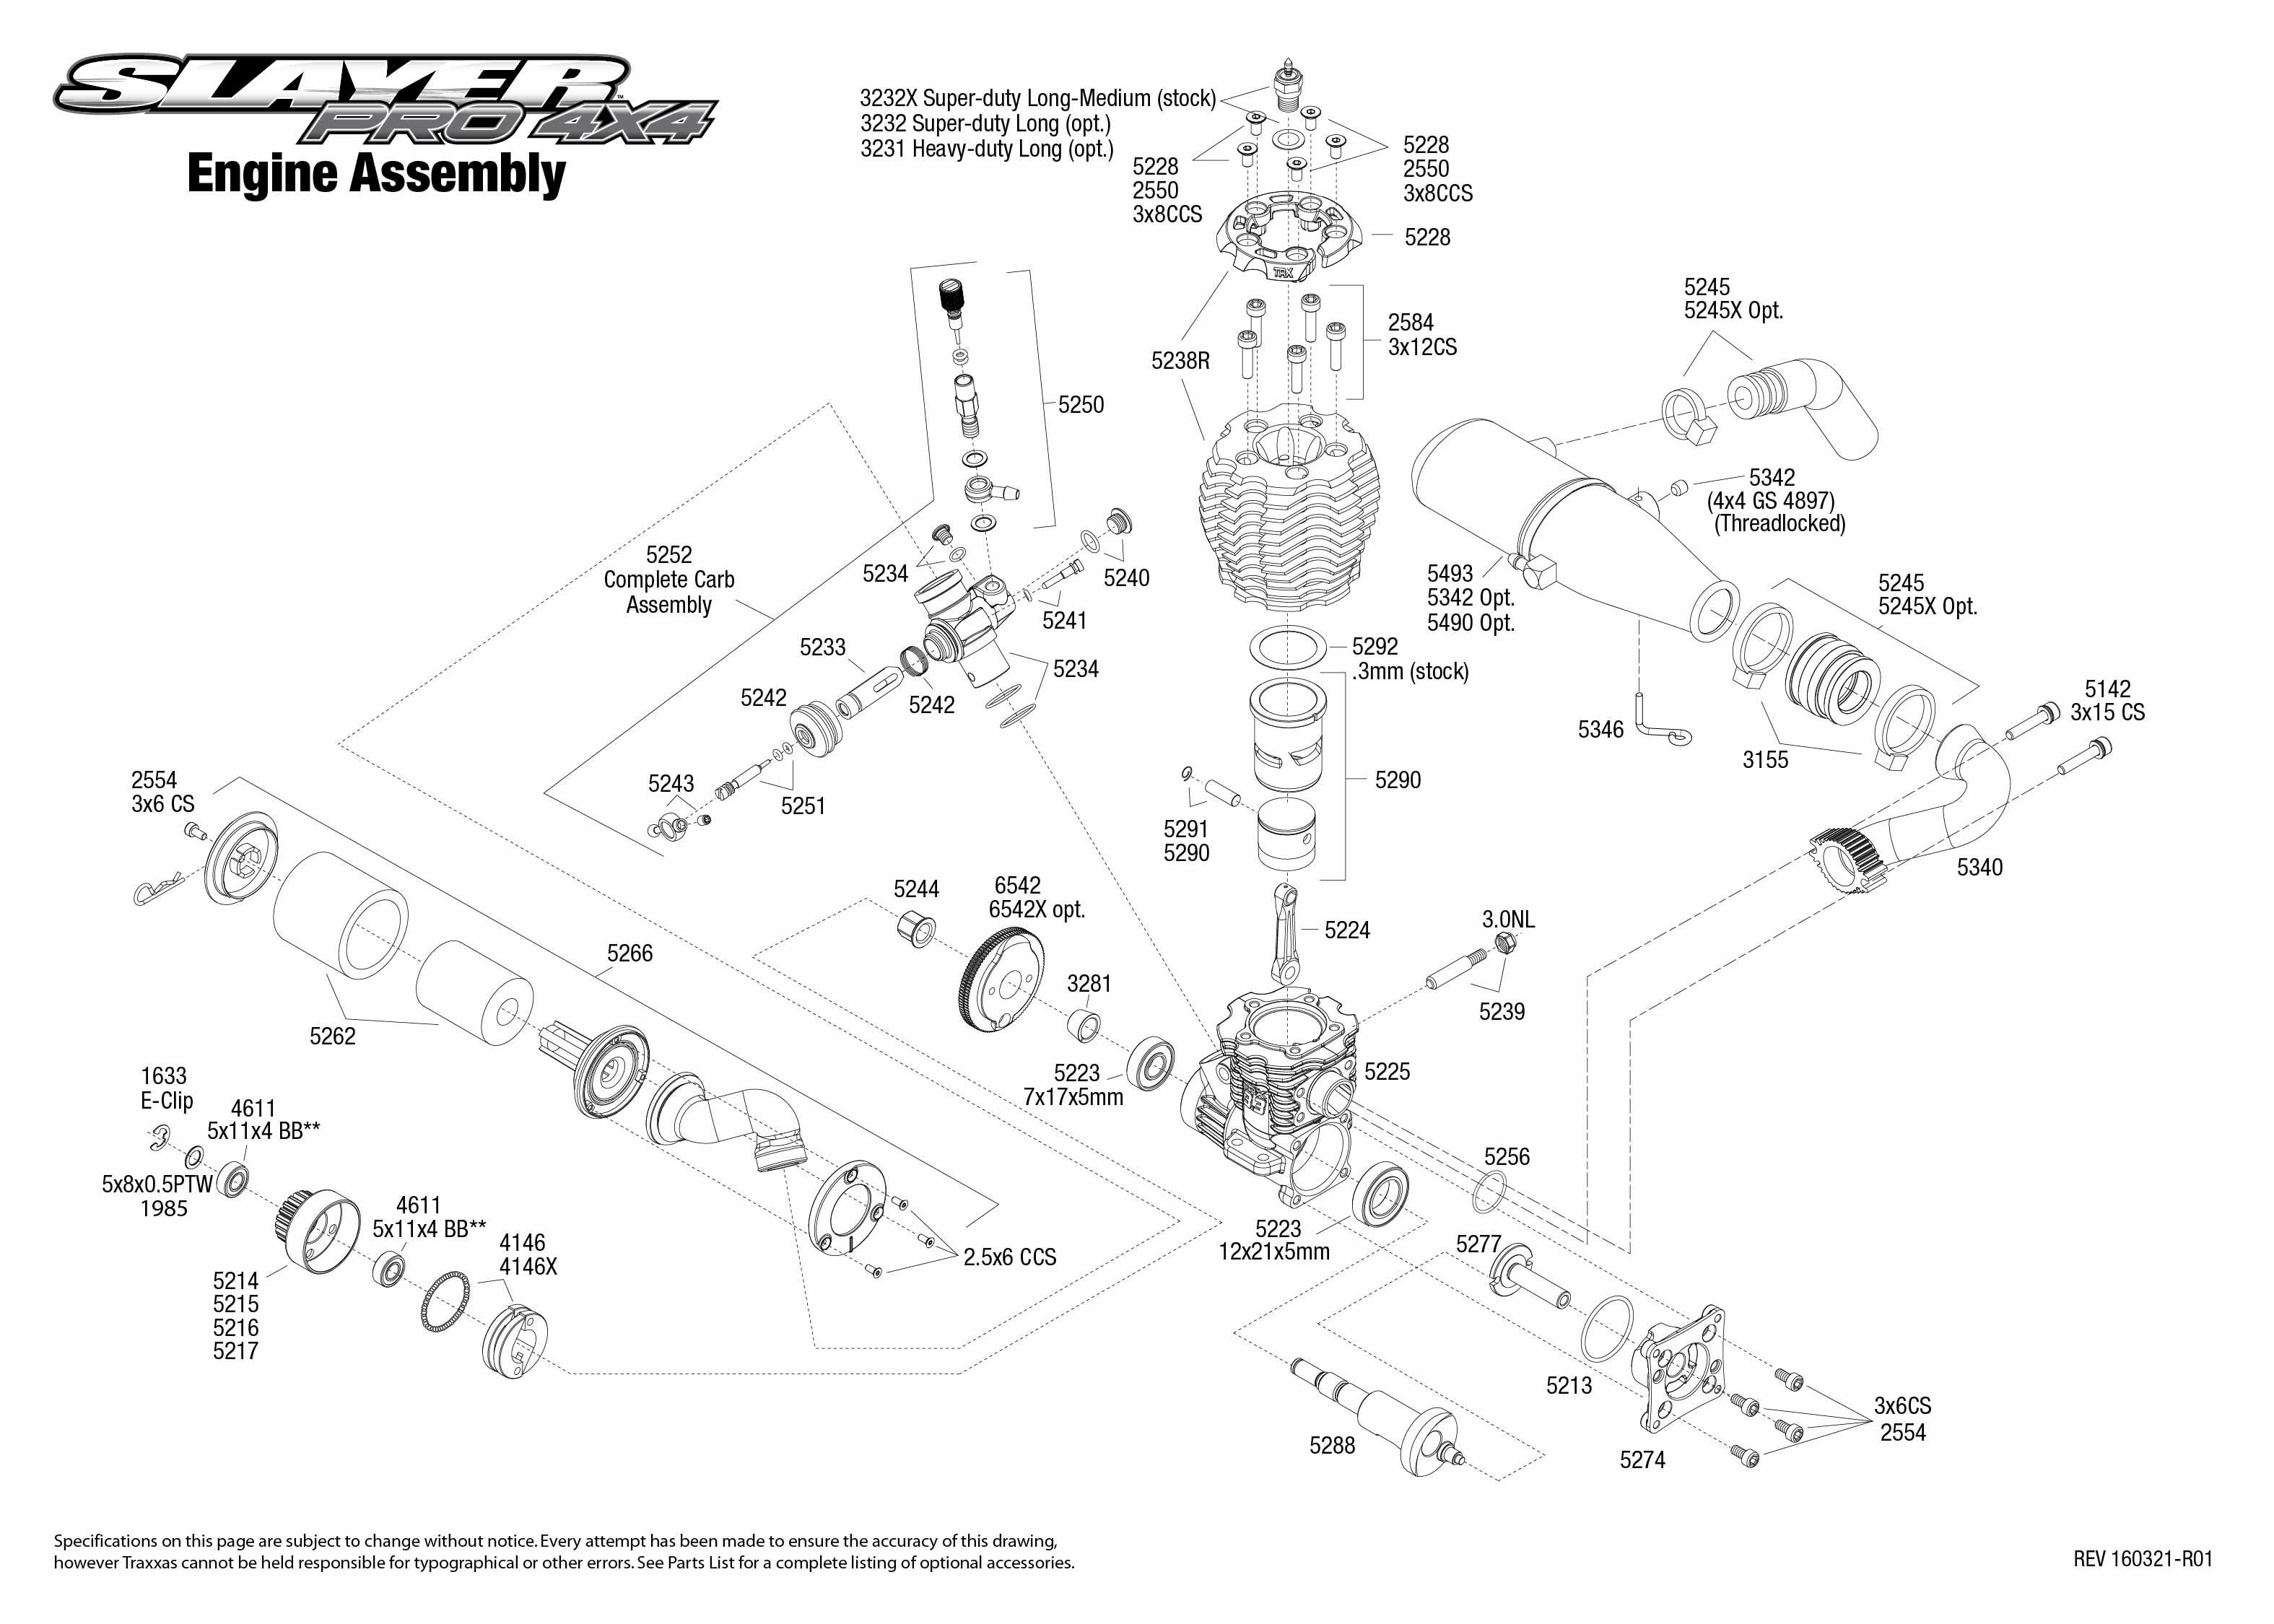 traxxas engine diagram traxxas slayer pro 4wd 3.3 1:10 rtr - tqi - tsm | eurorc.com traxxas wiring diagram